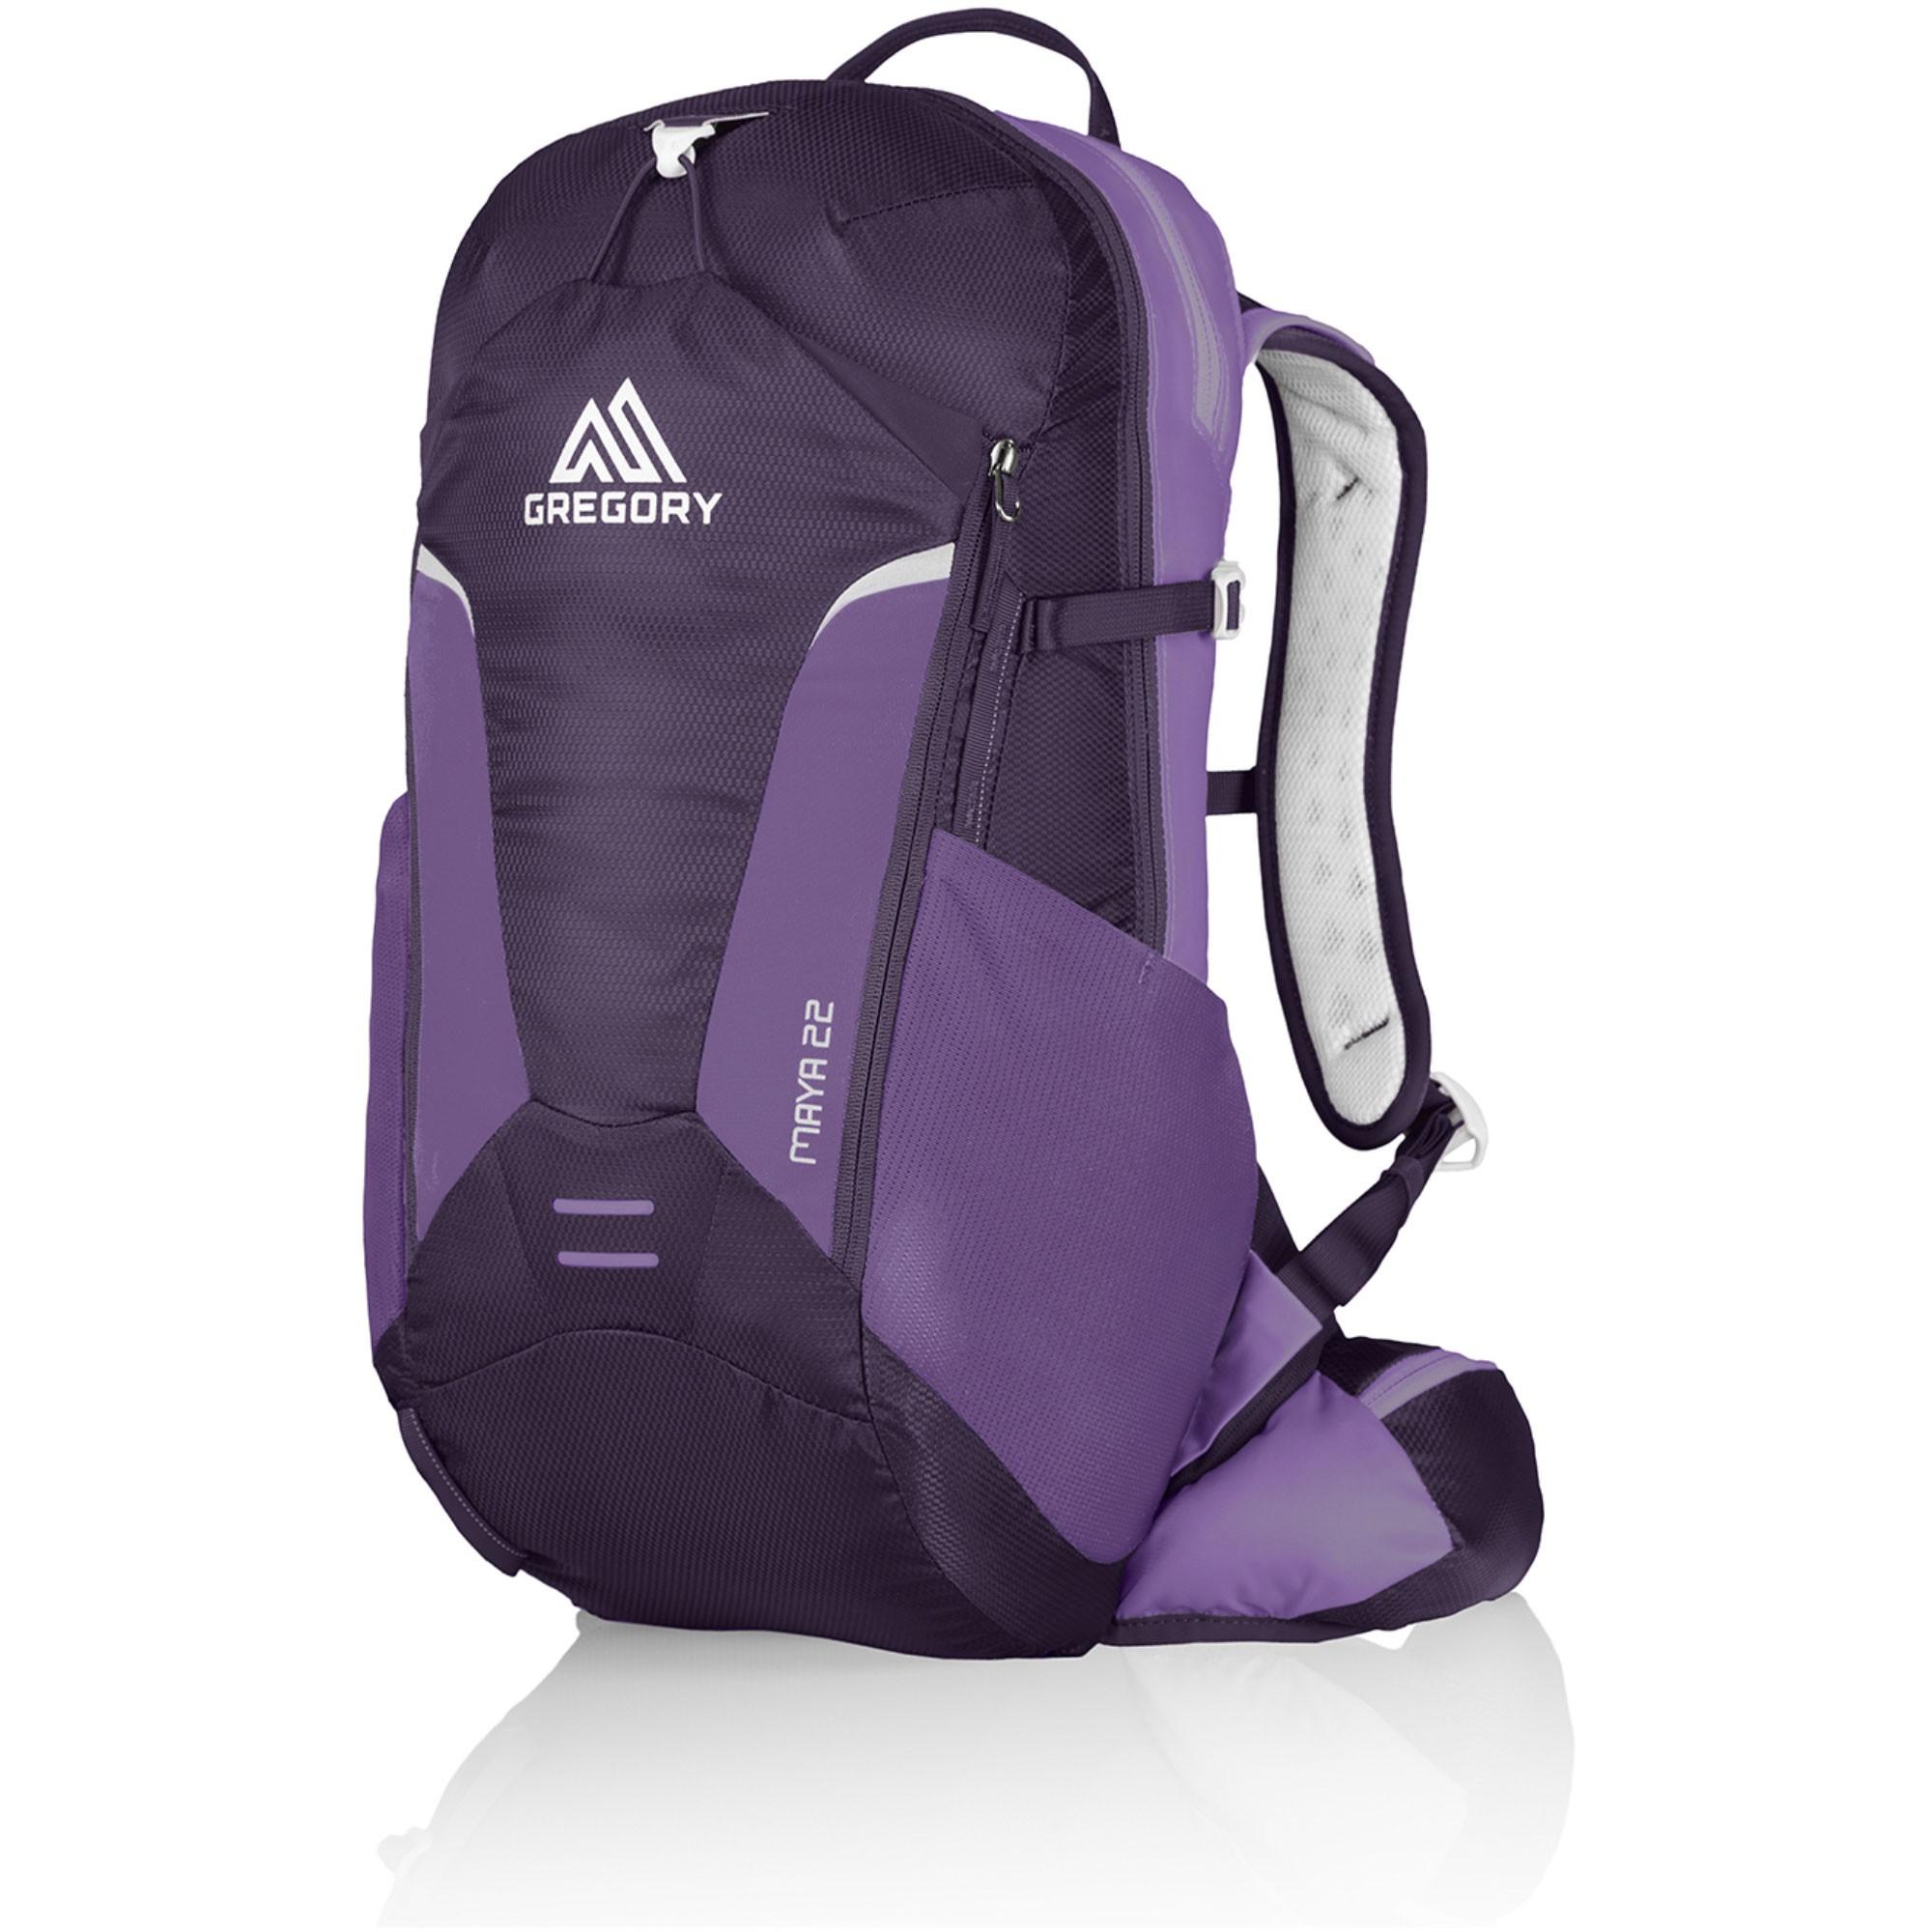 GREGORY - Maya 10 Women's Rucksack - Mountain Purple